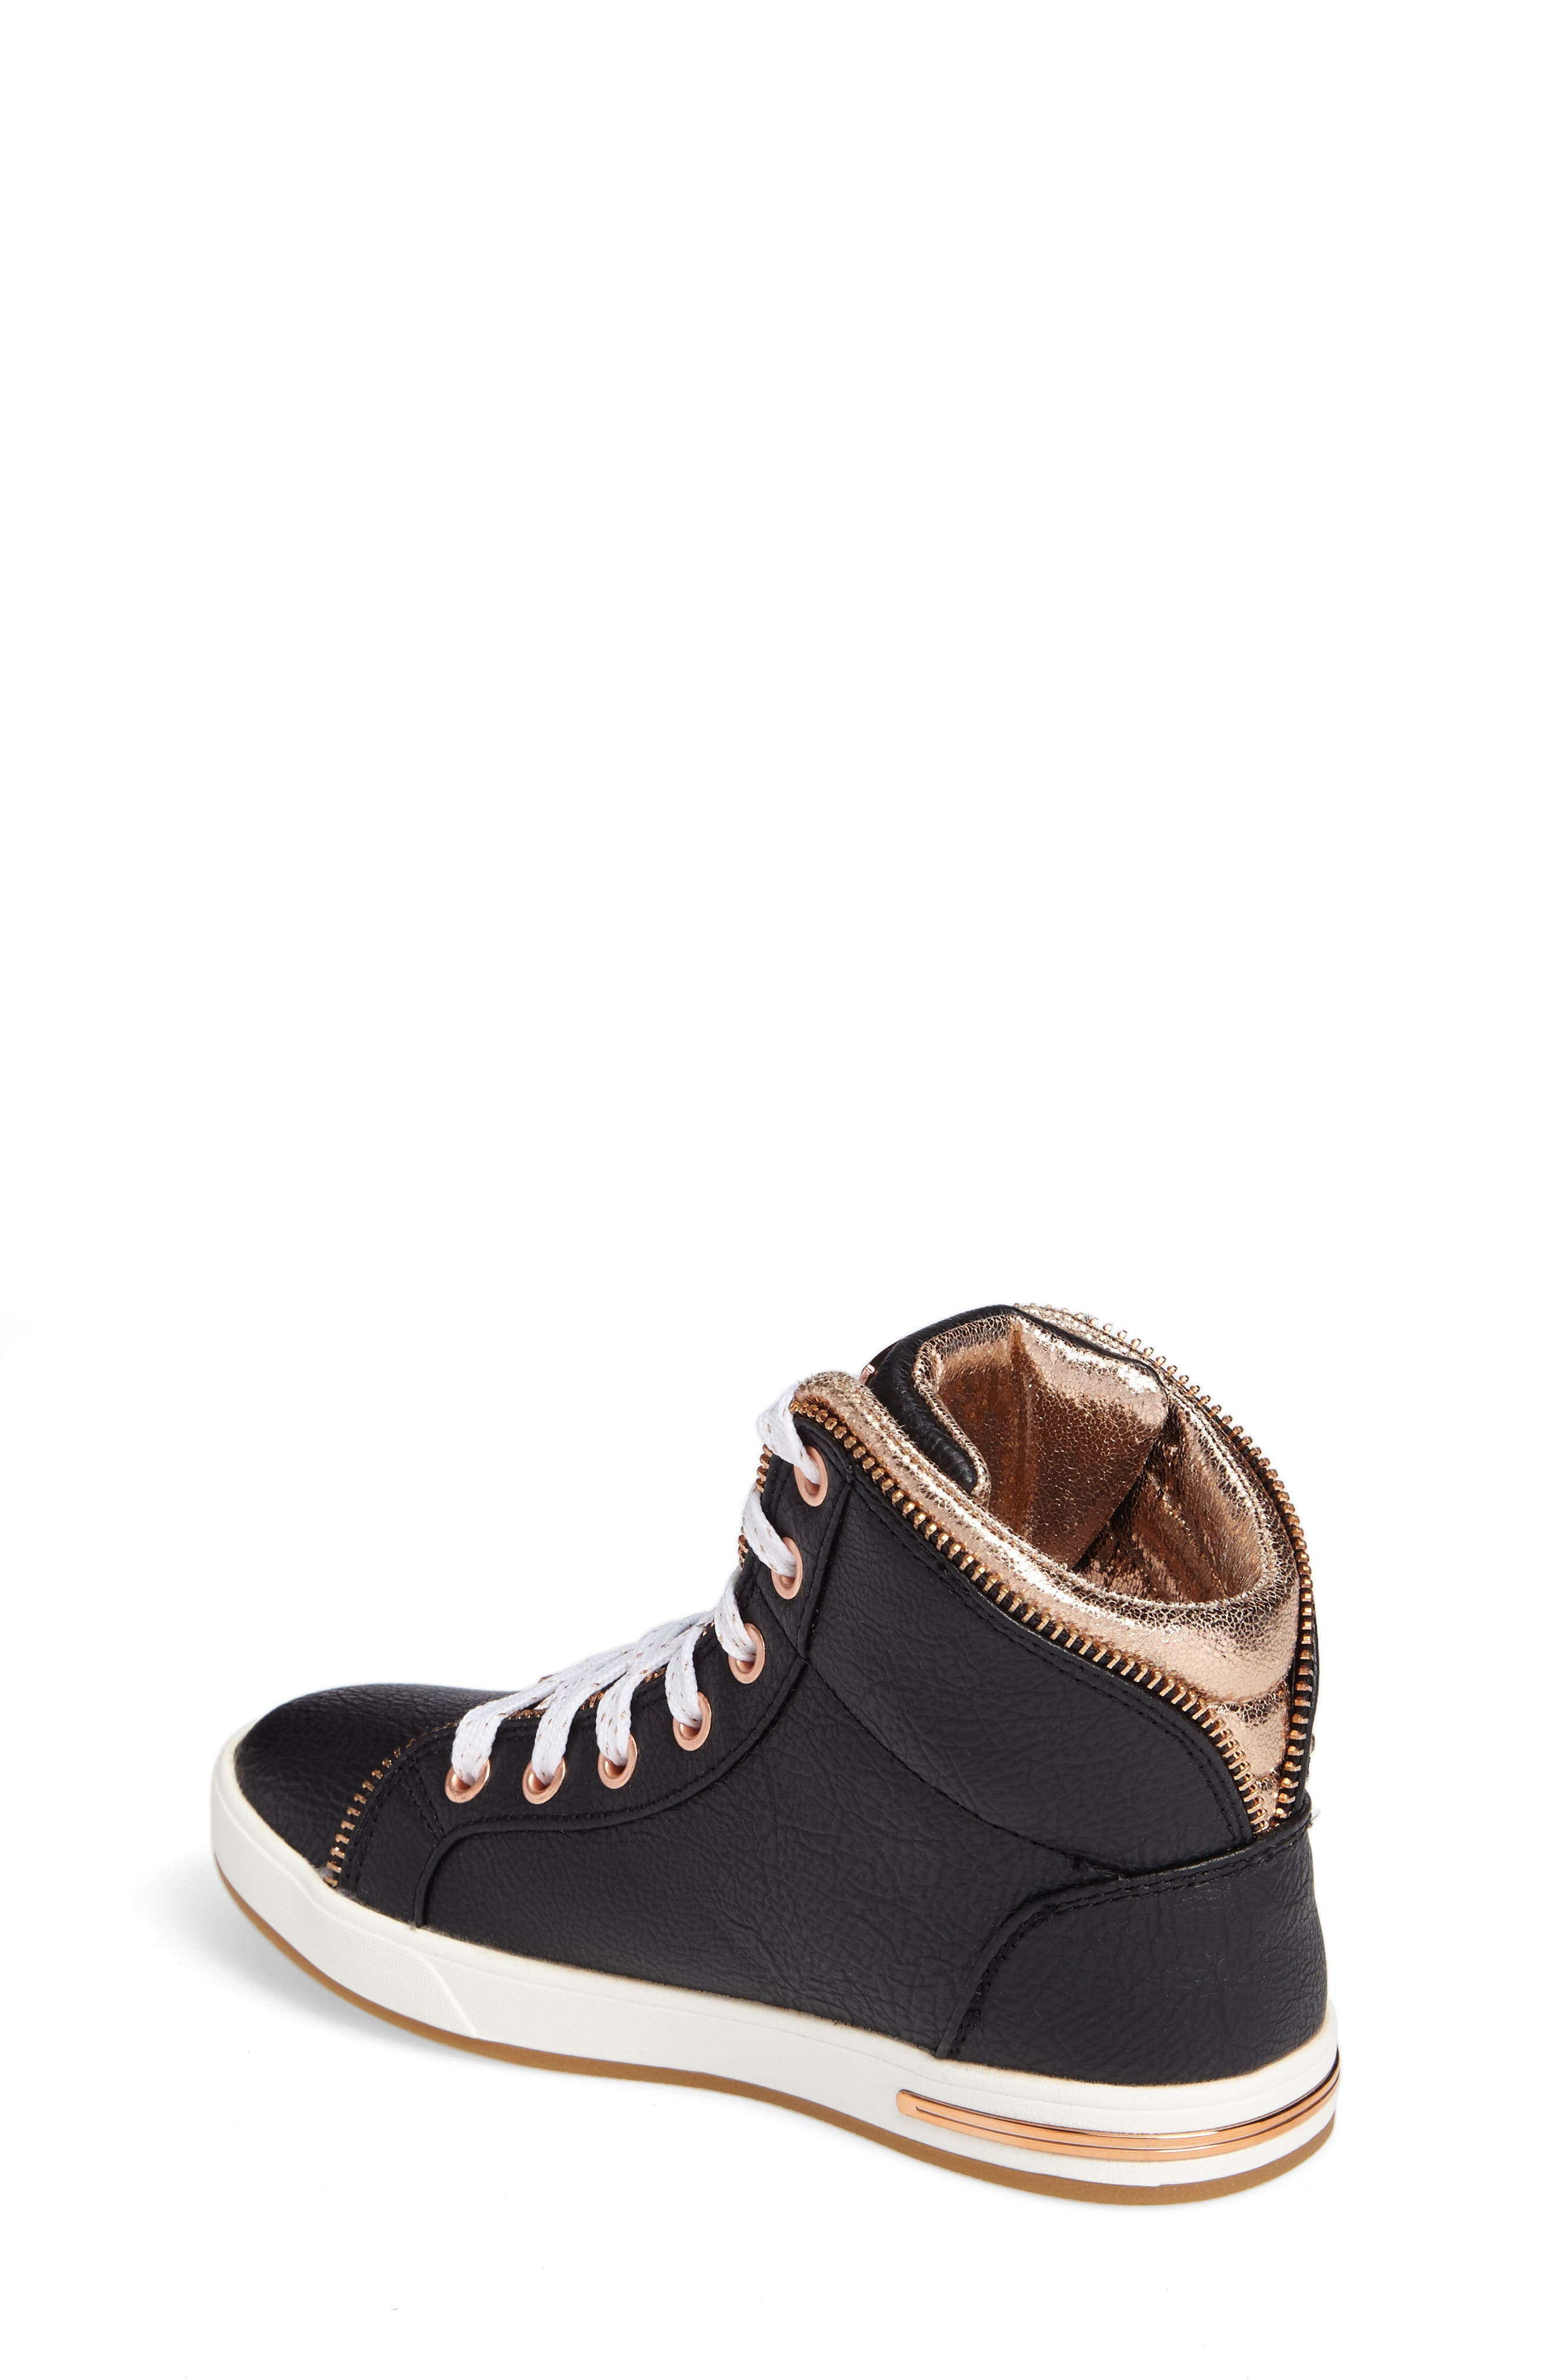 Shoutouts Embellished High Top Sneaker,                             Alternate thumbnail 2, color,                             Black/ Rose Gold